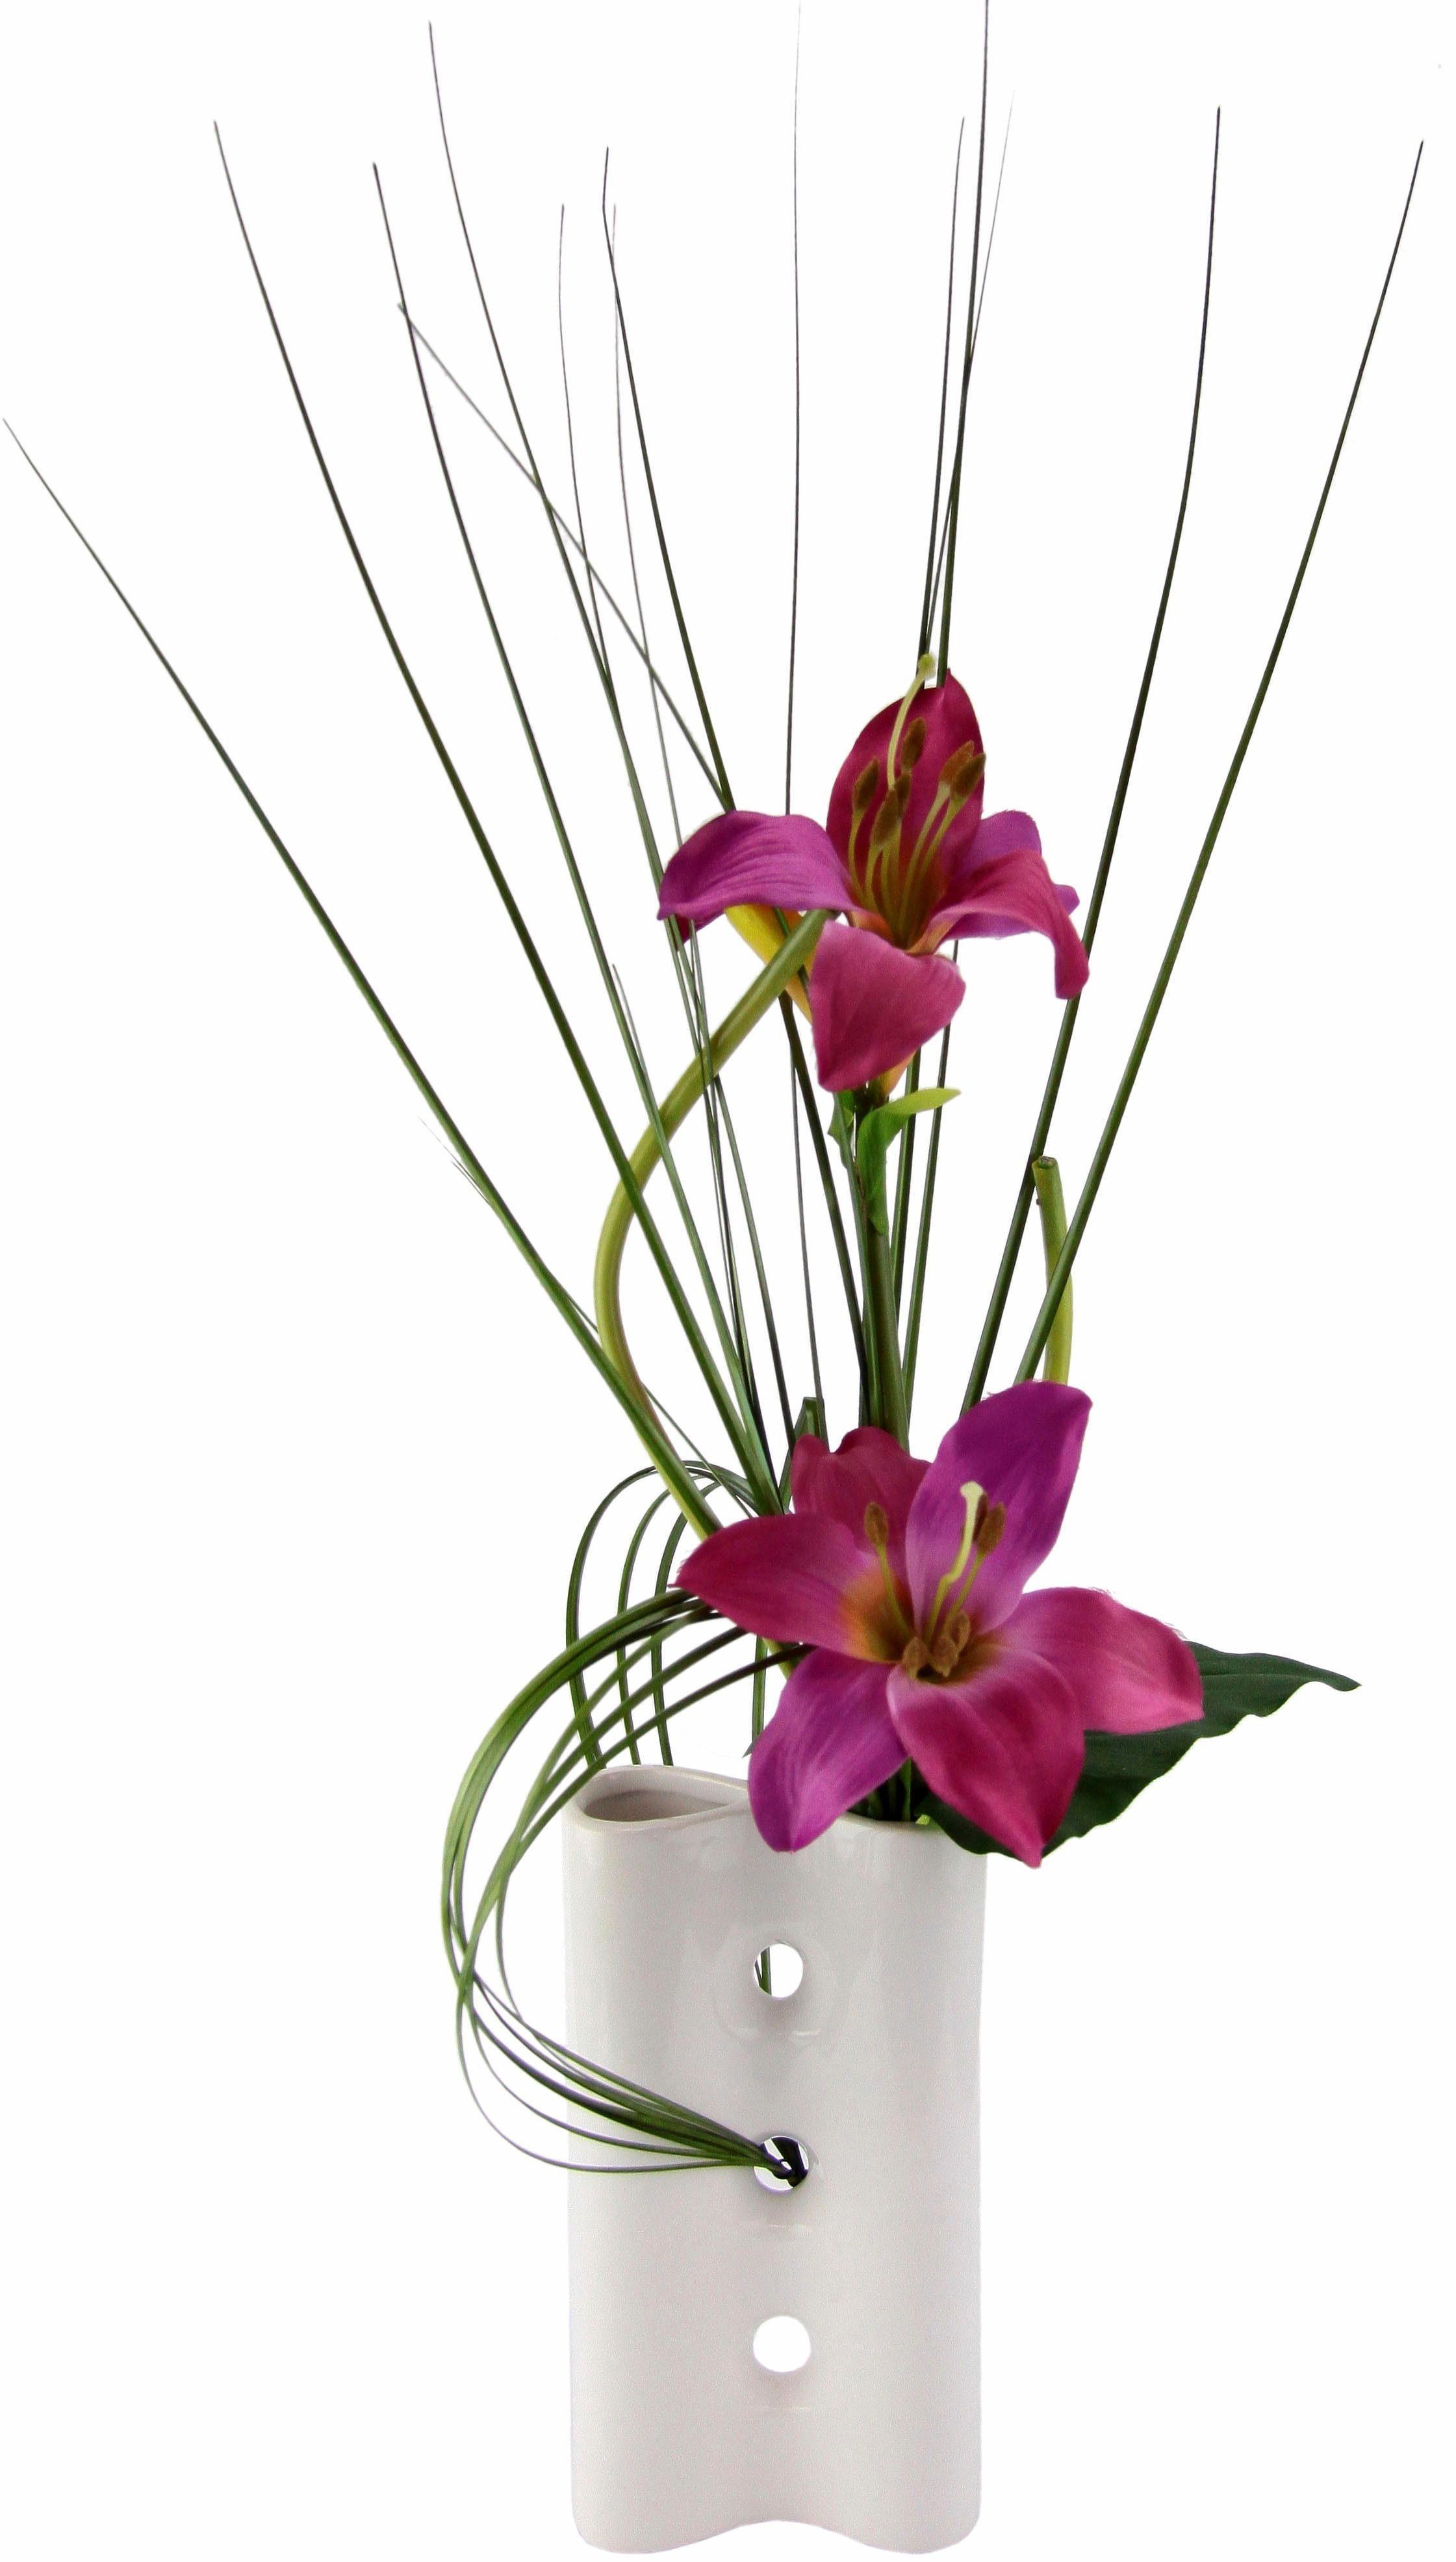 Home affaire Kunstblume »Lilien« in Vase